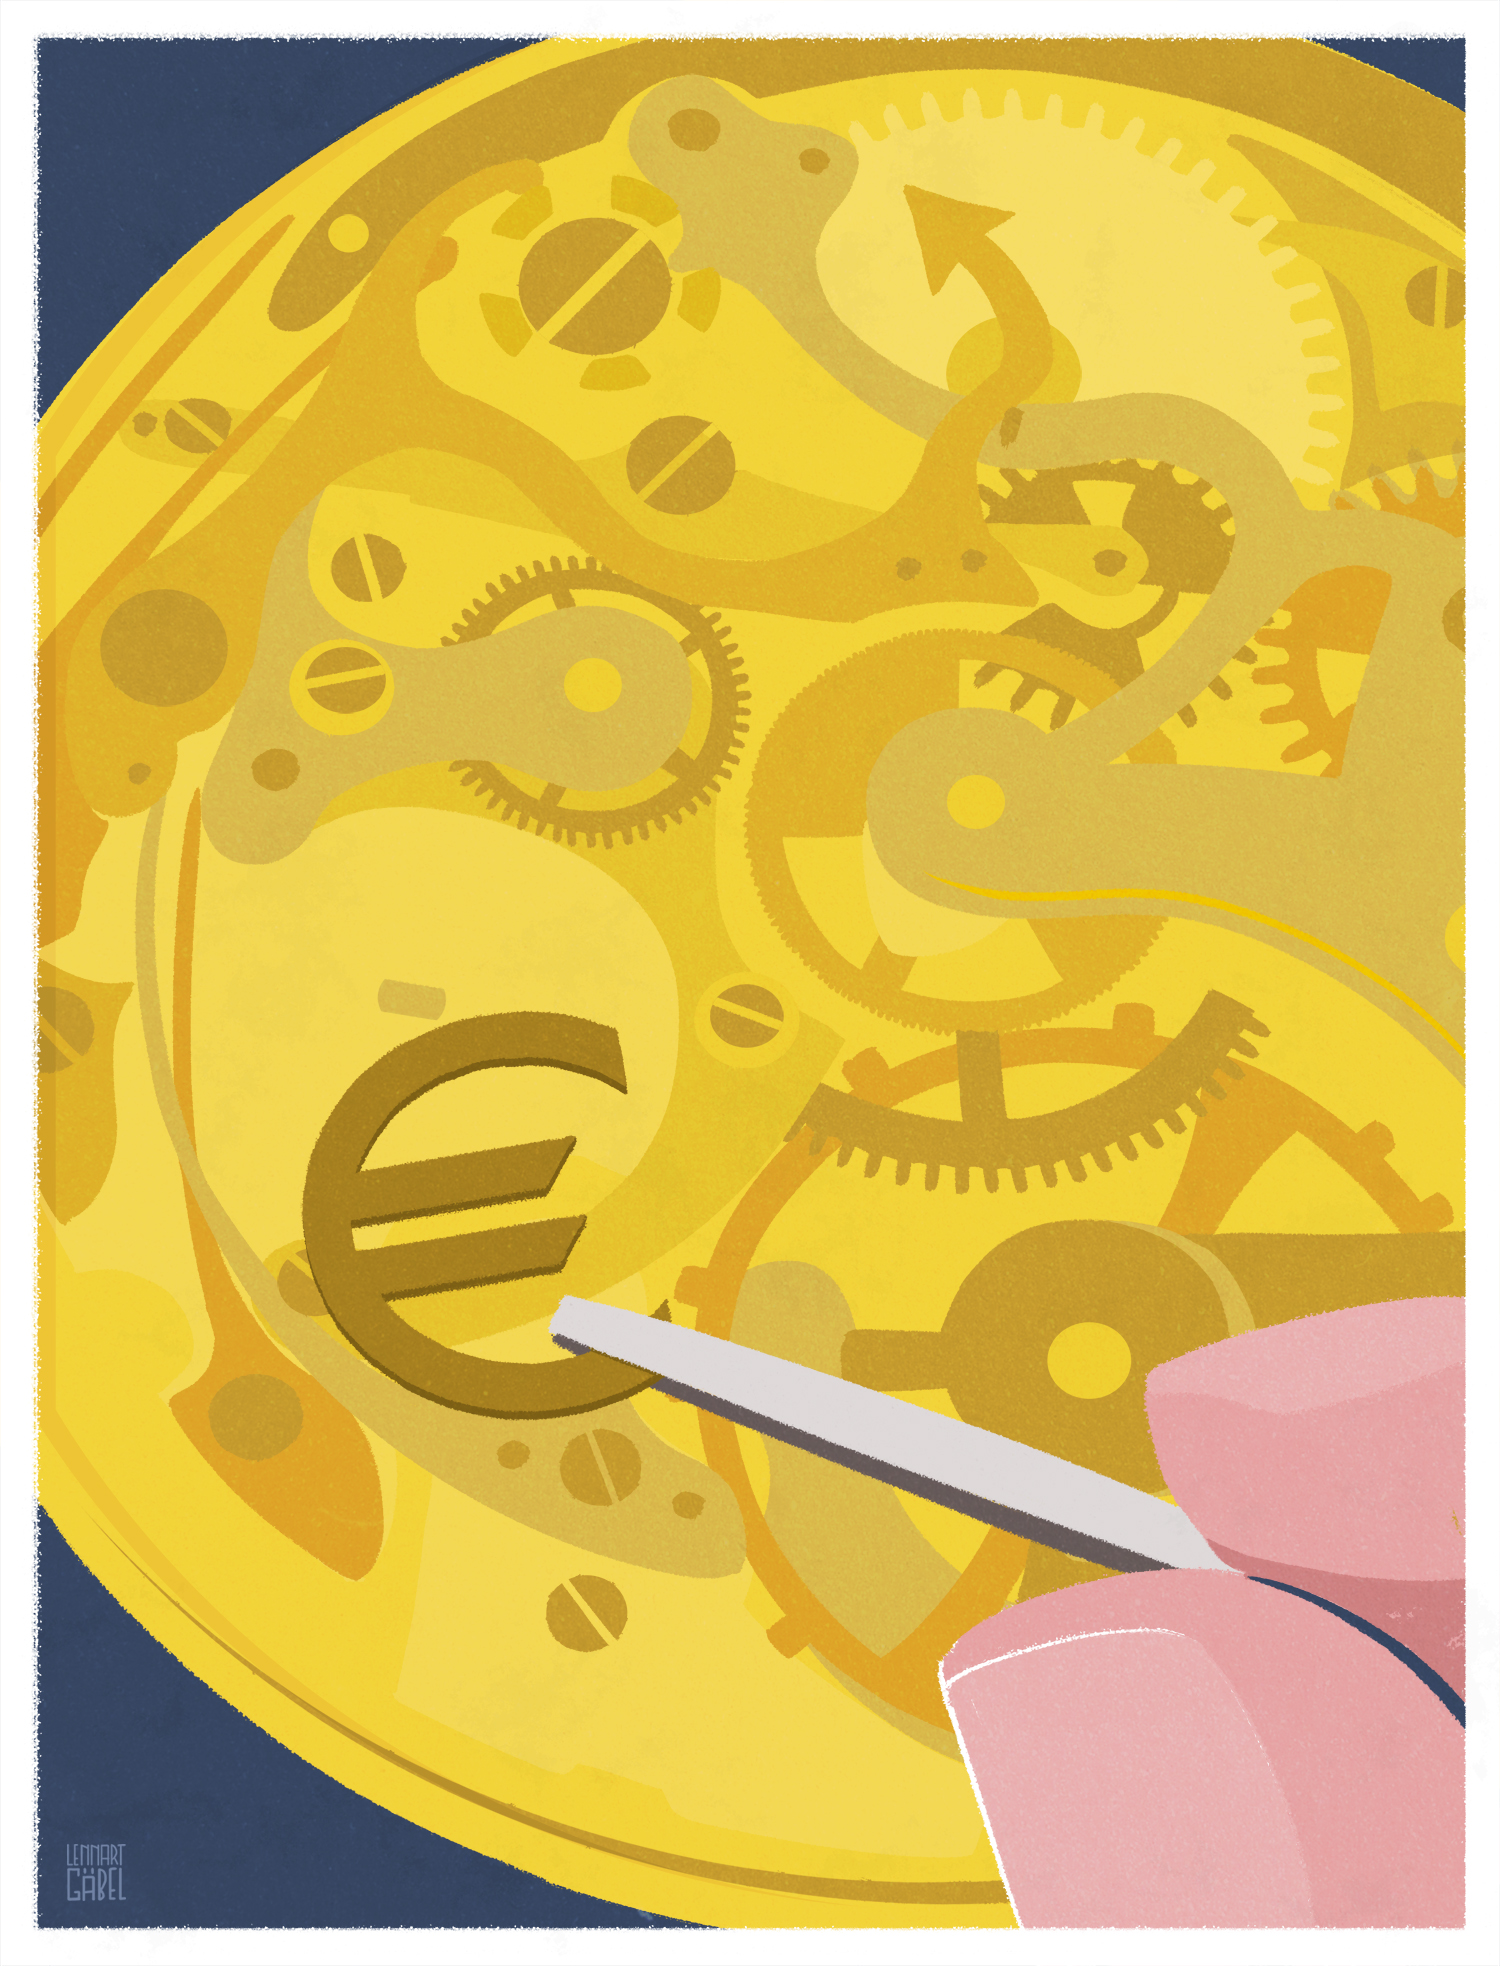 150129_GZ_Schweiz_Euro_Lennart_Gaebel_Illustration.jpg